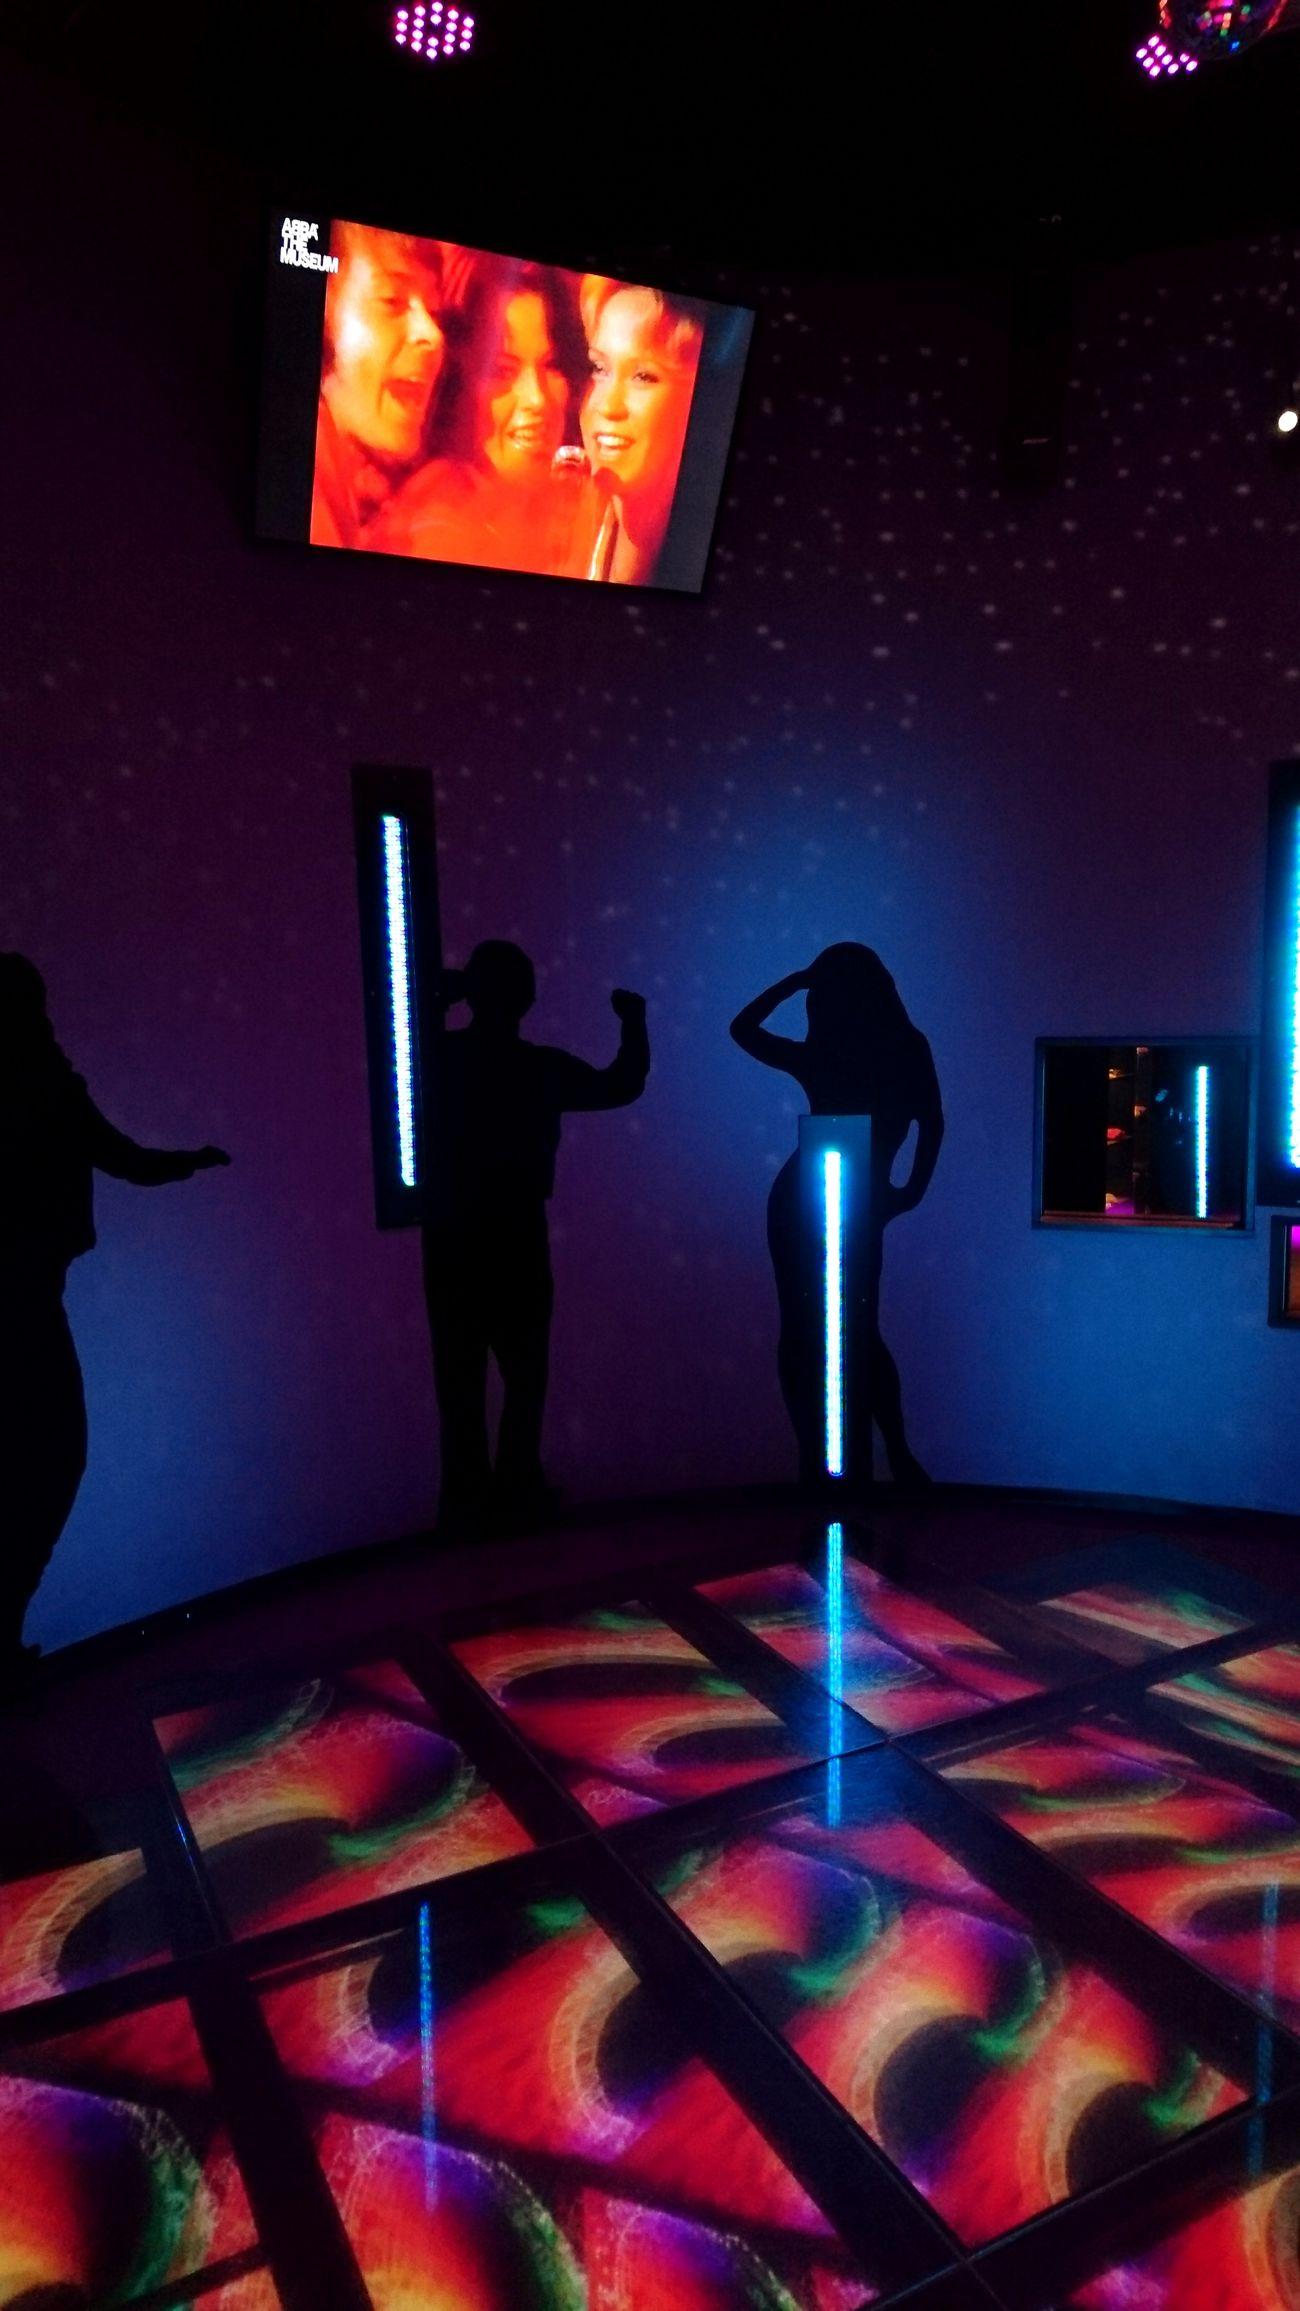 Arts Culture And Entertainment AbbaMuseumet Abbamuseum